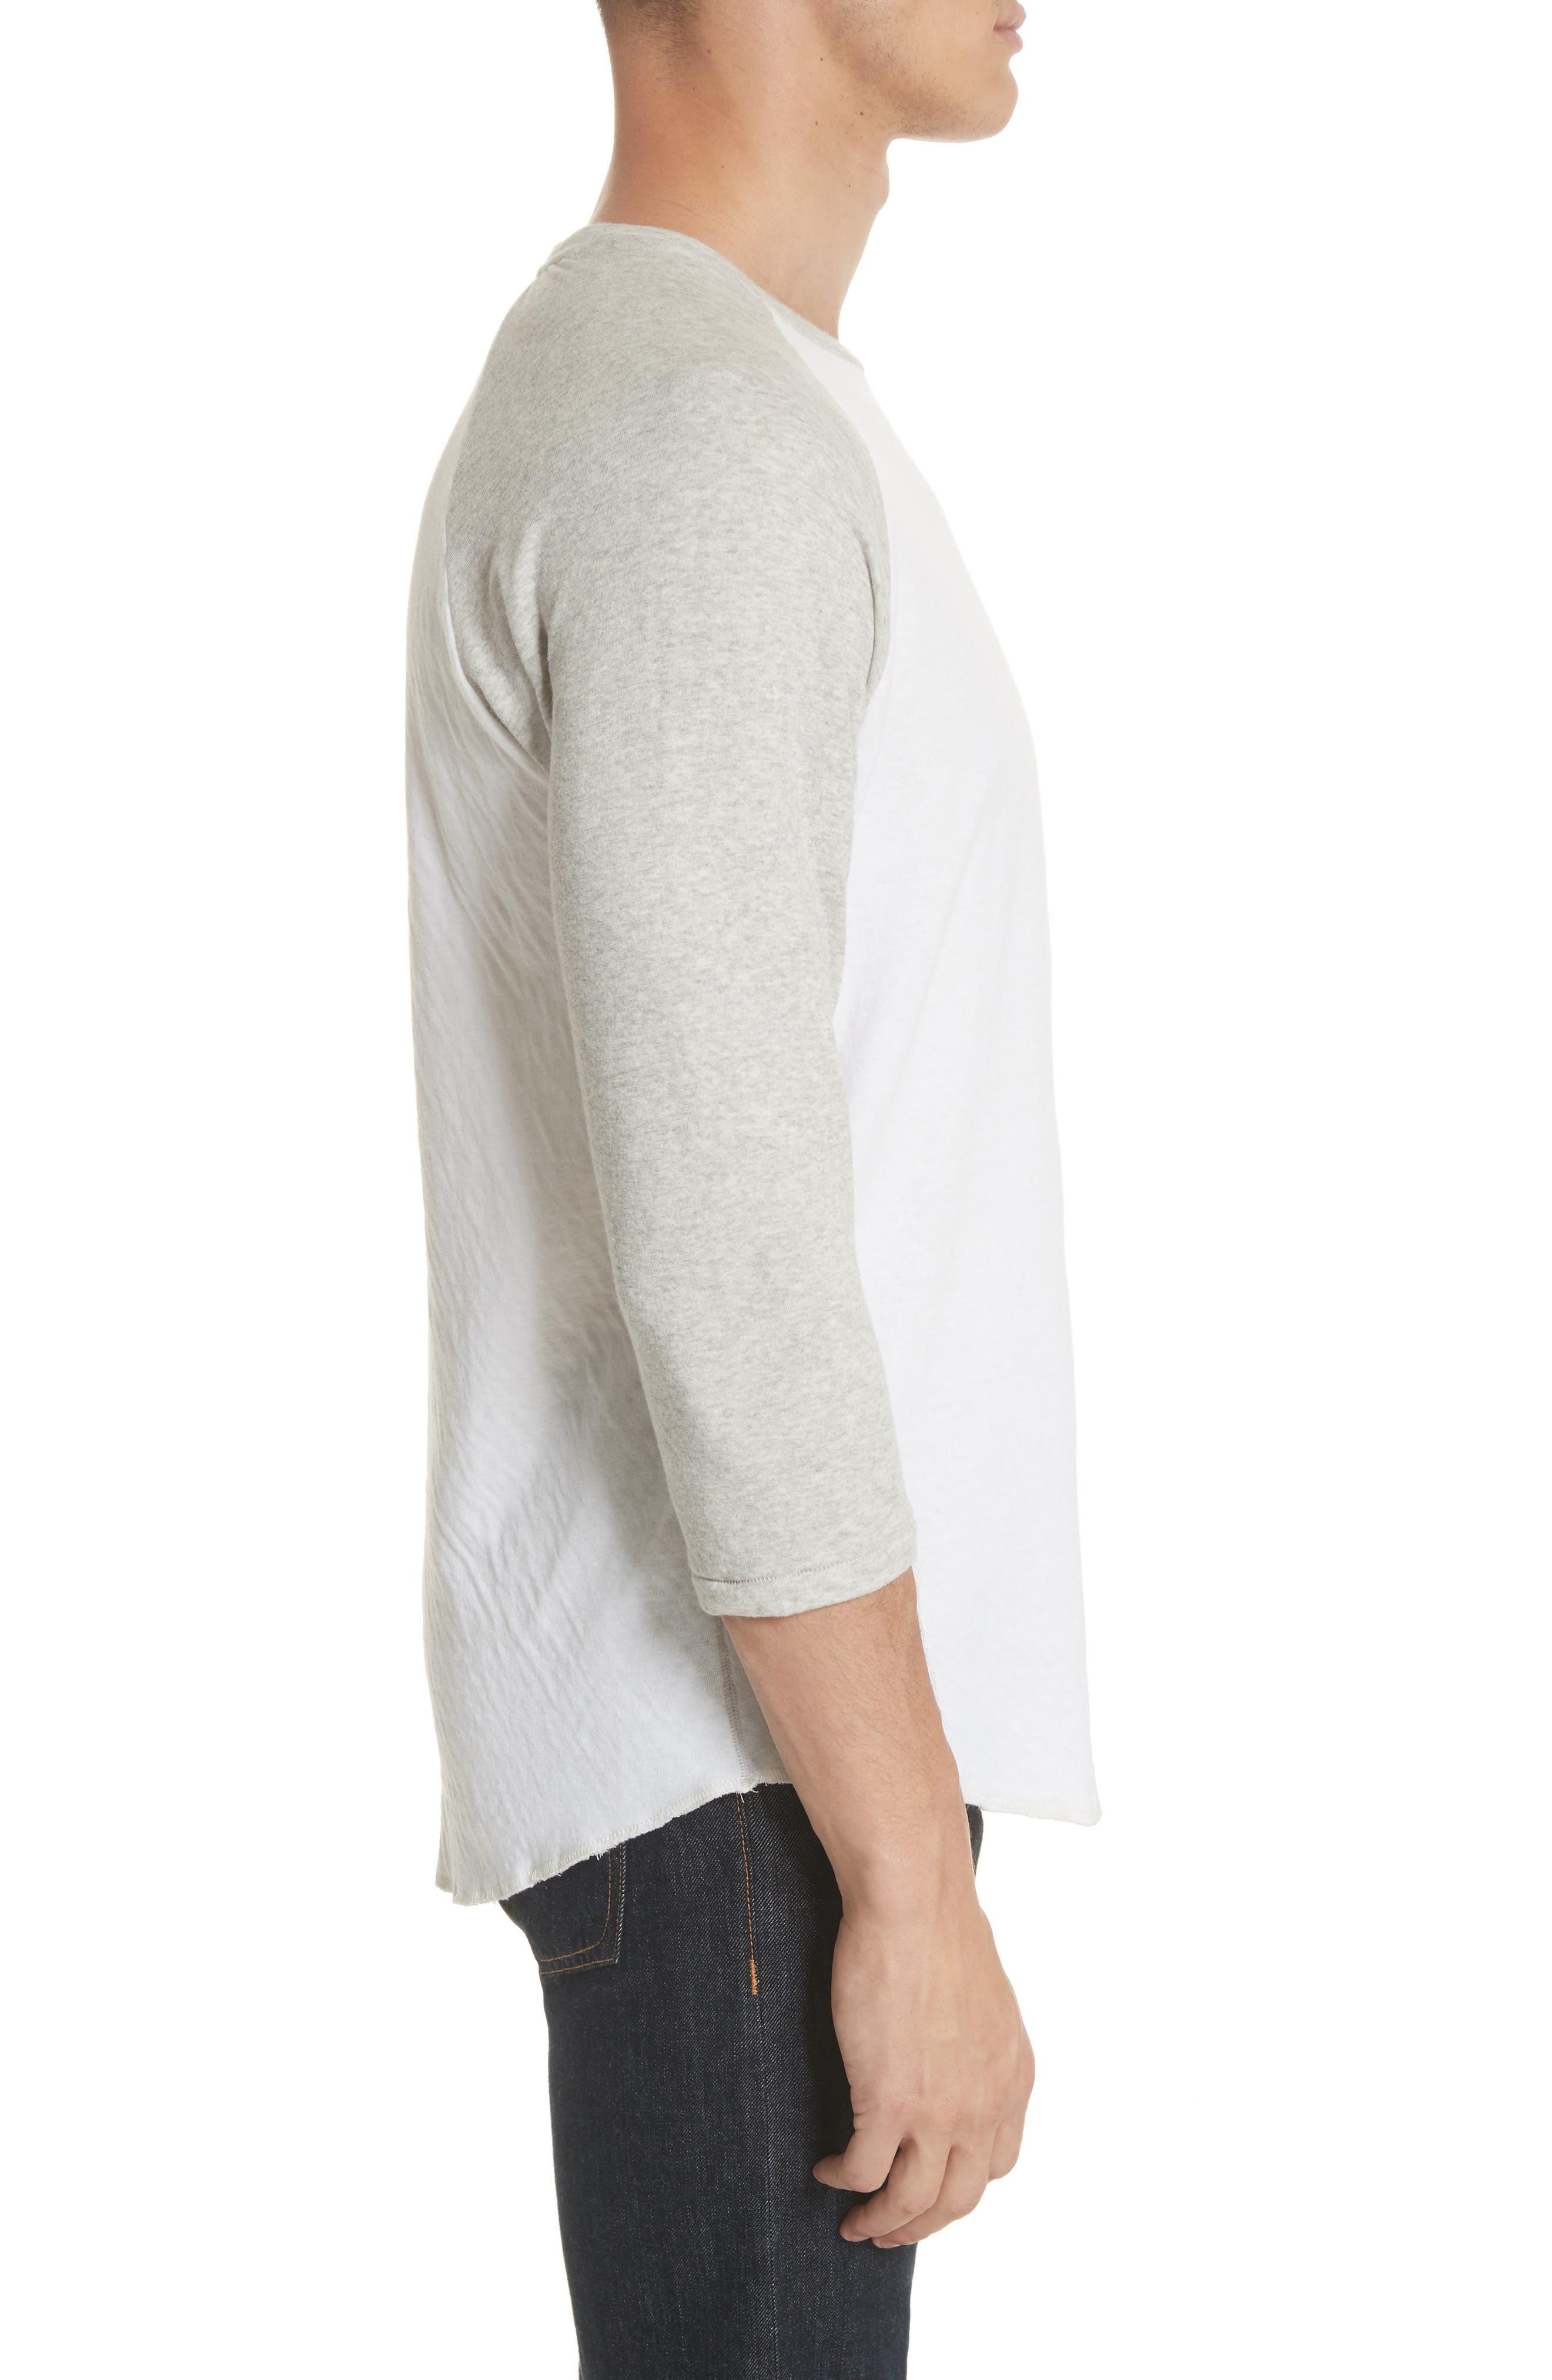 Rigby Baseball T-Shirt,                             Alternate thumbnail 3, color,                             Grey/ White